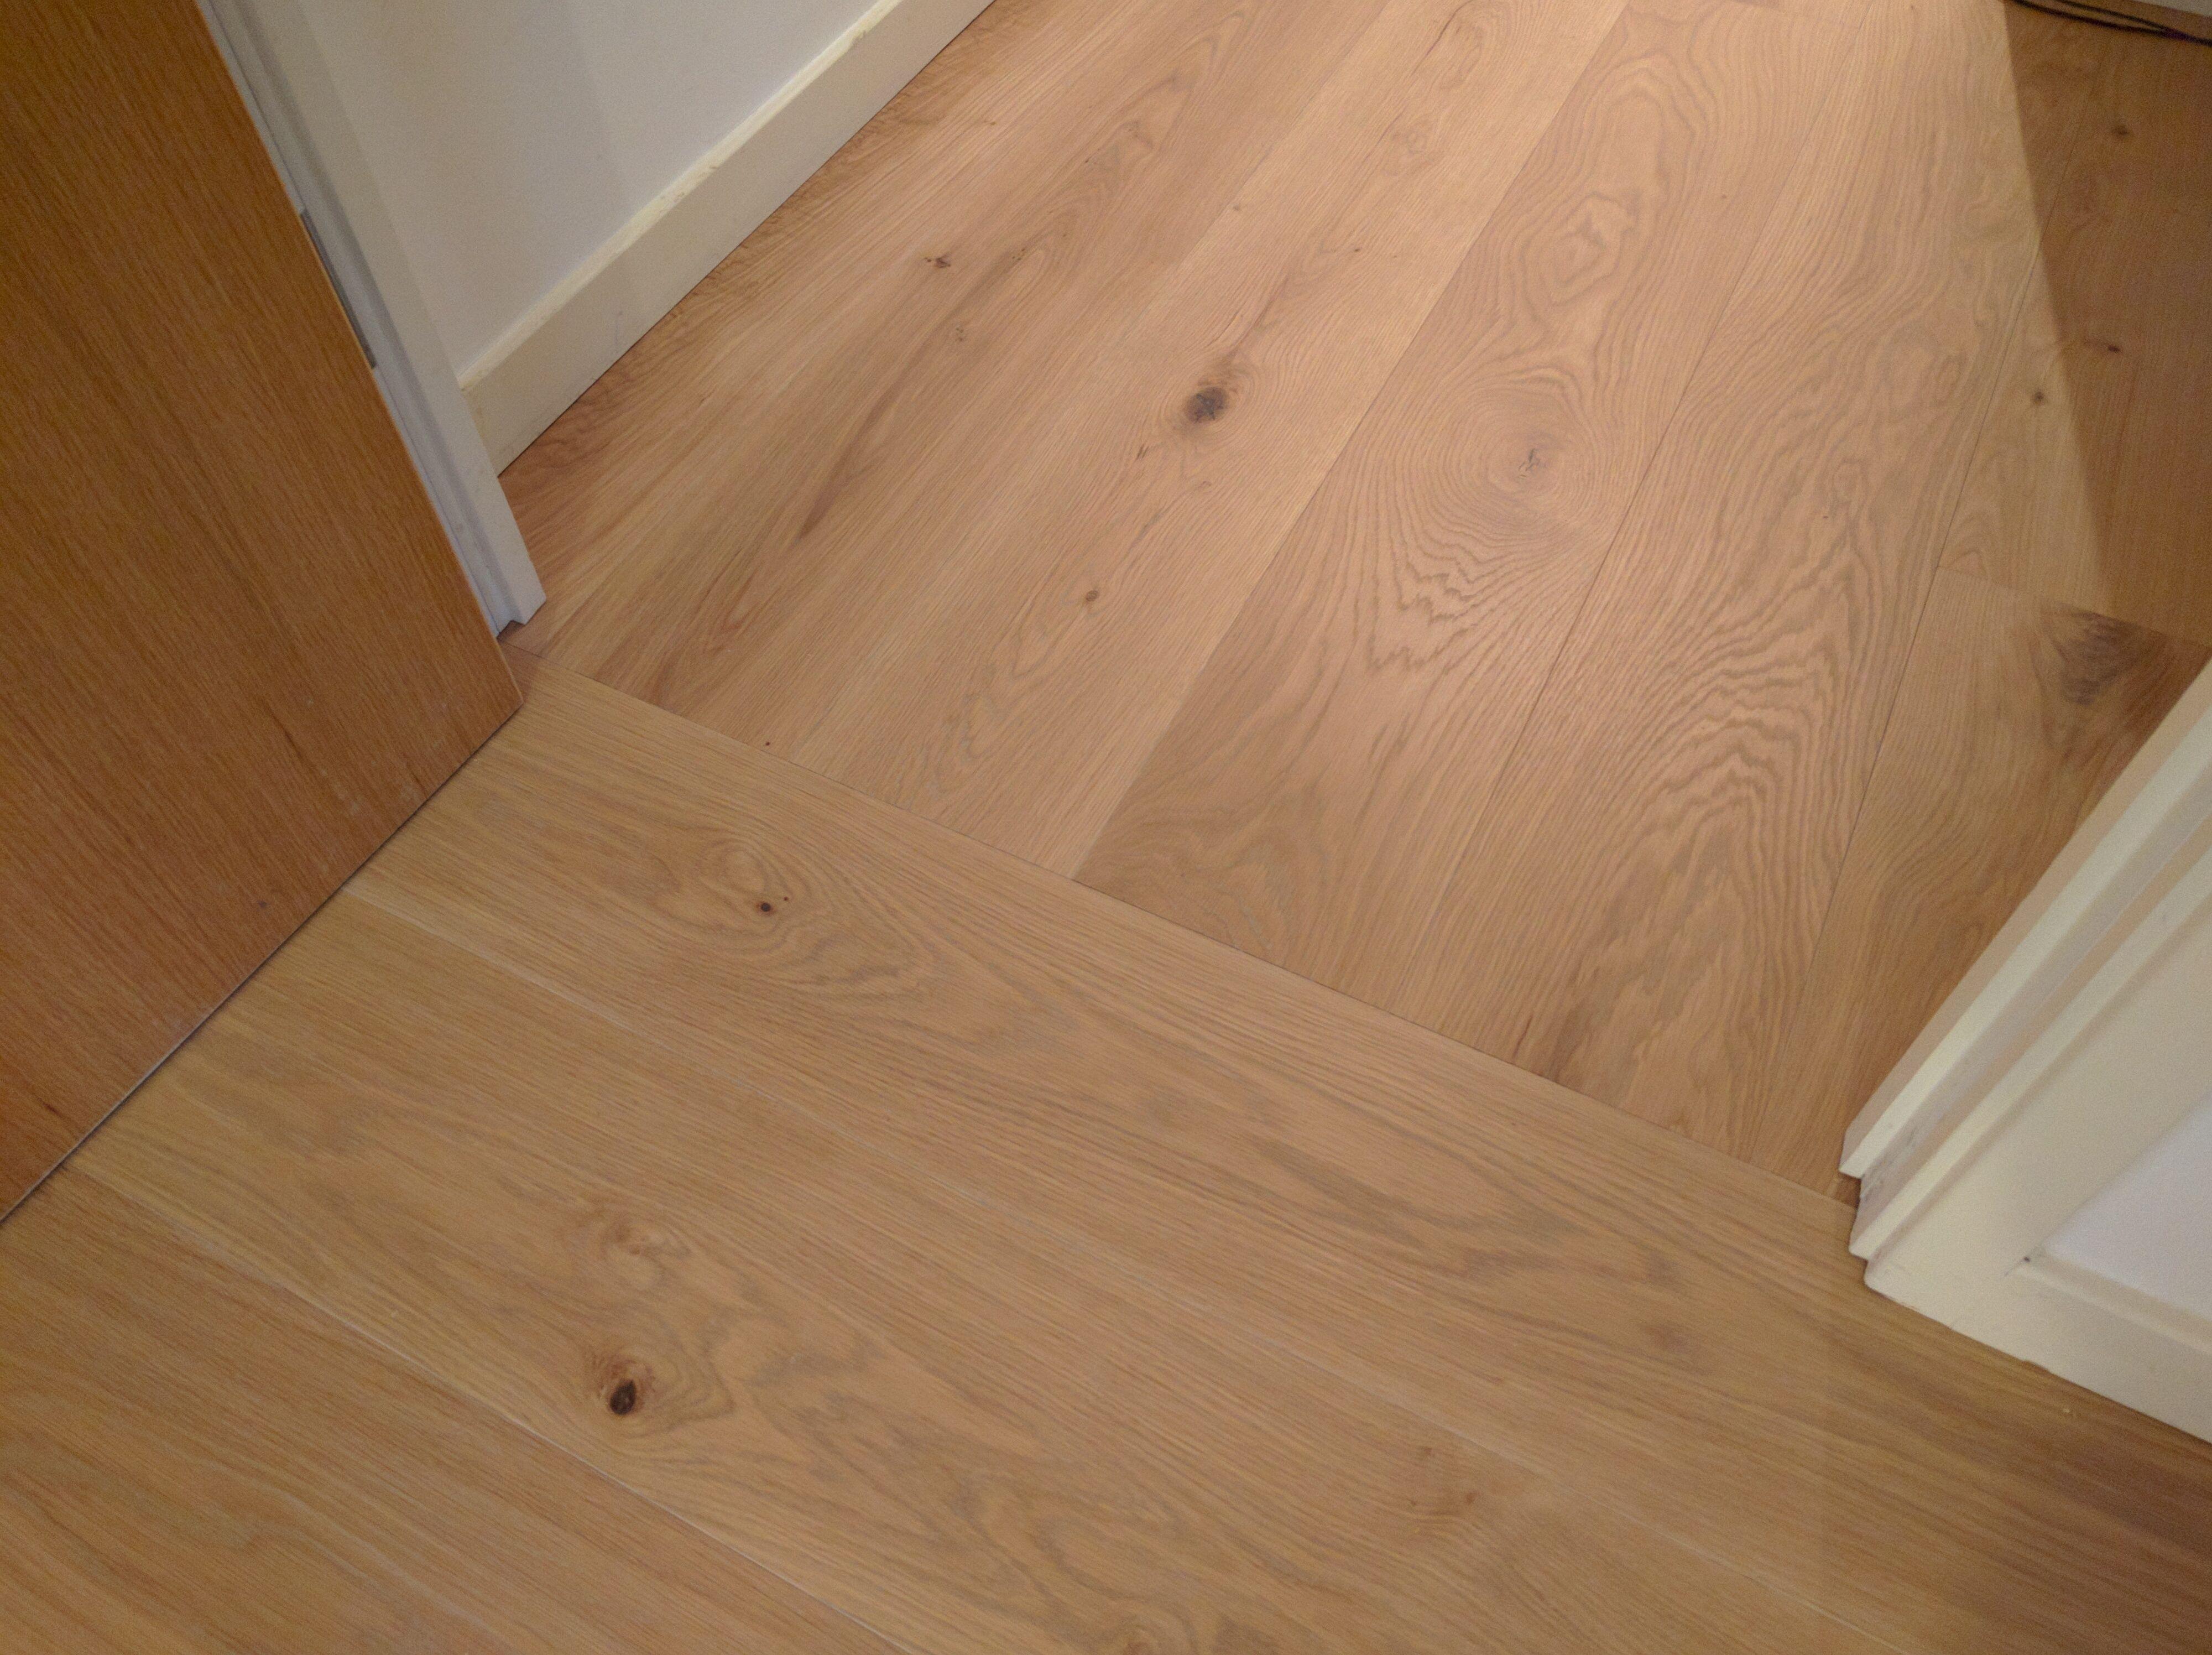 32+ Which way should wood floors run ideas